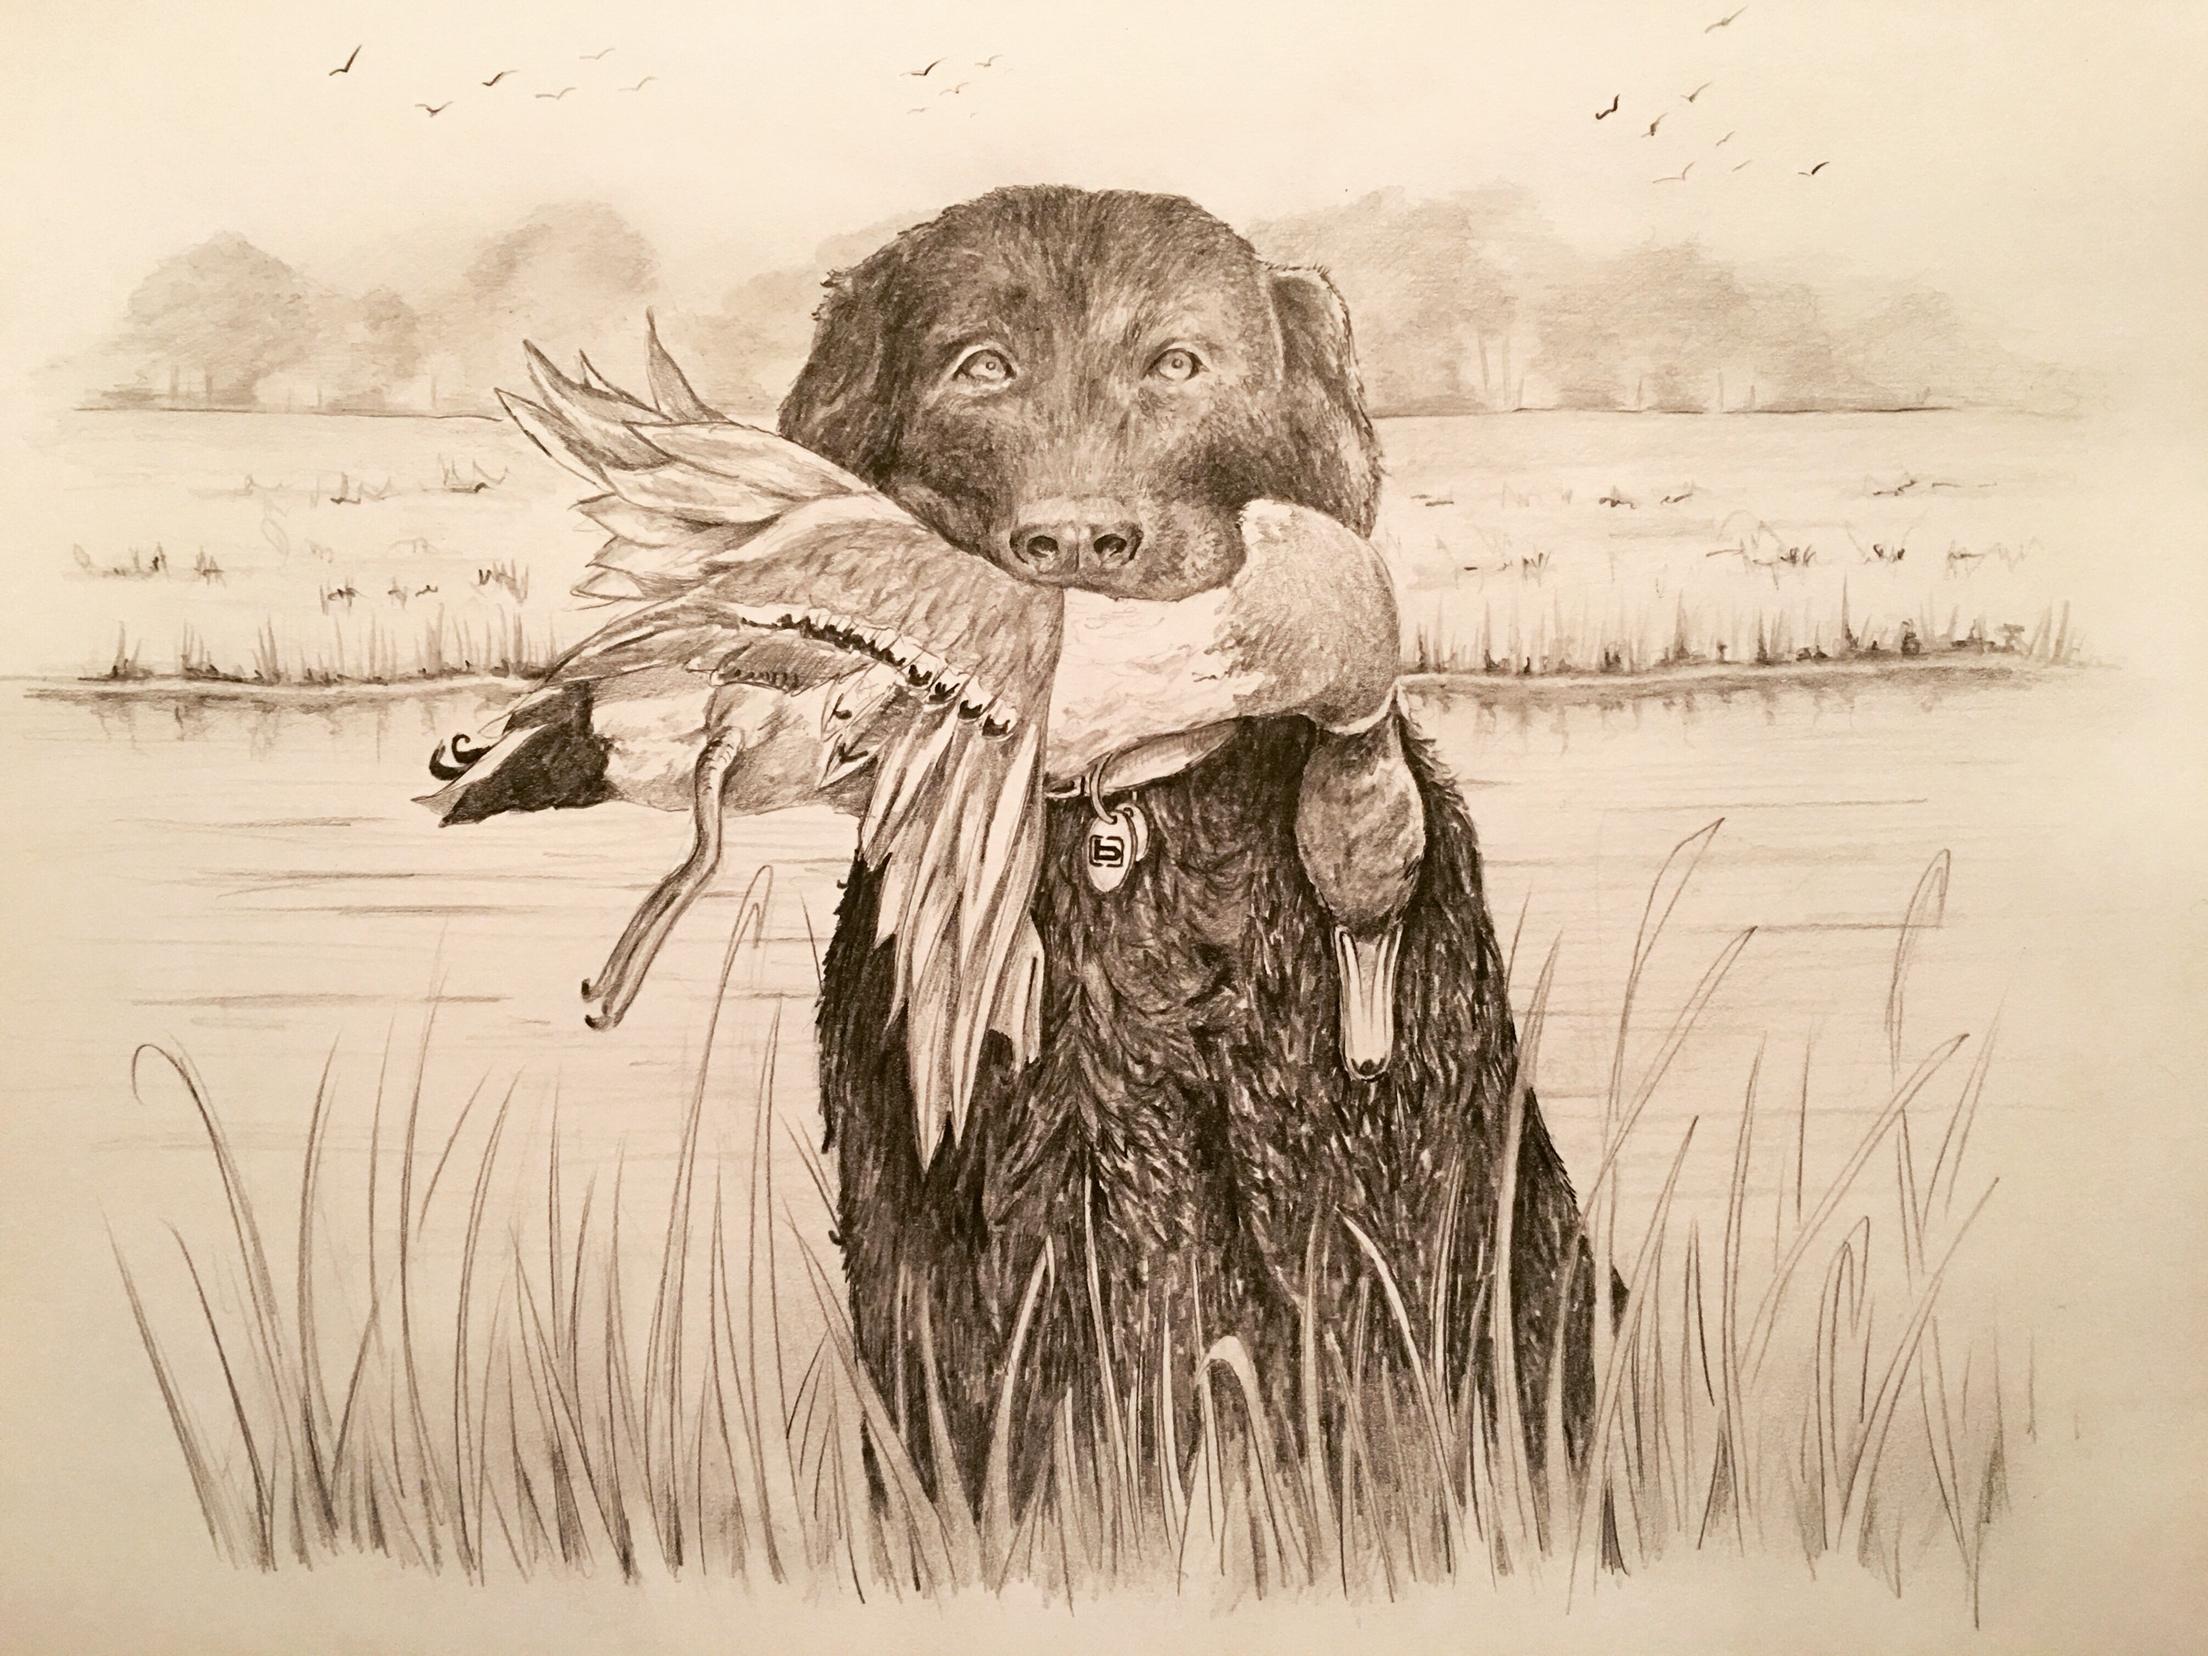 2208x1656 8.5x11 Pencil On Paper Hunt'N Buddy Wildlife Art, Drawing